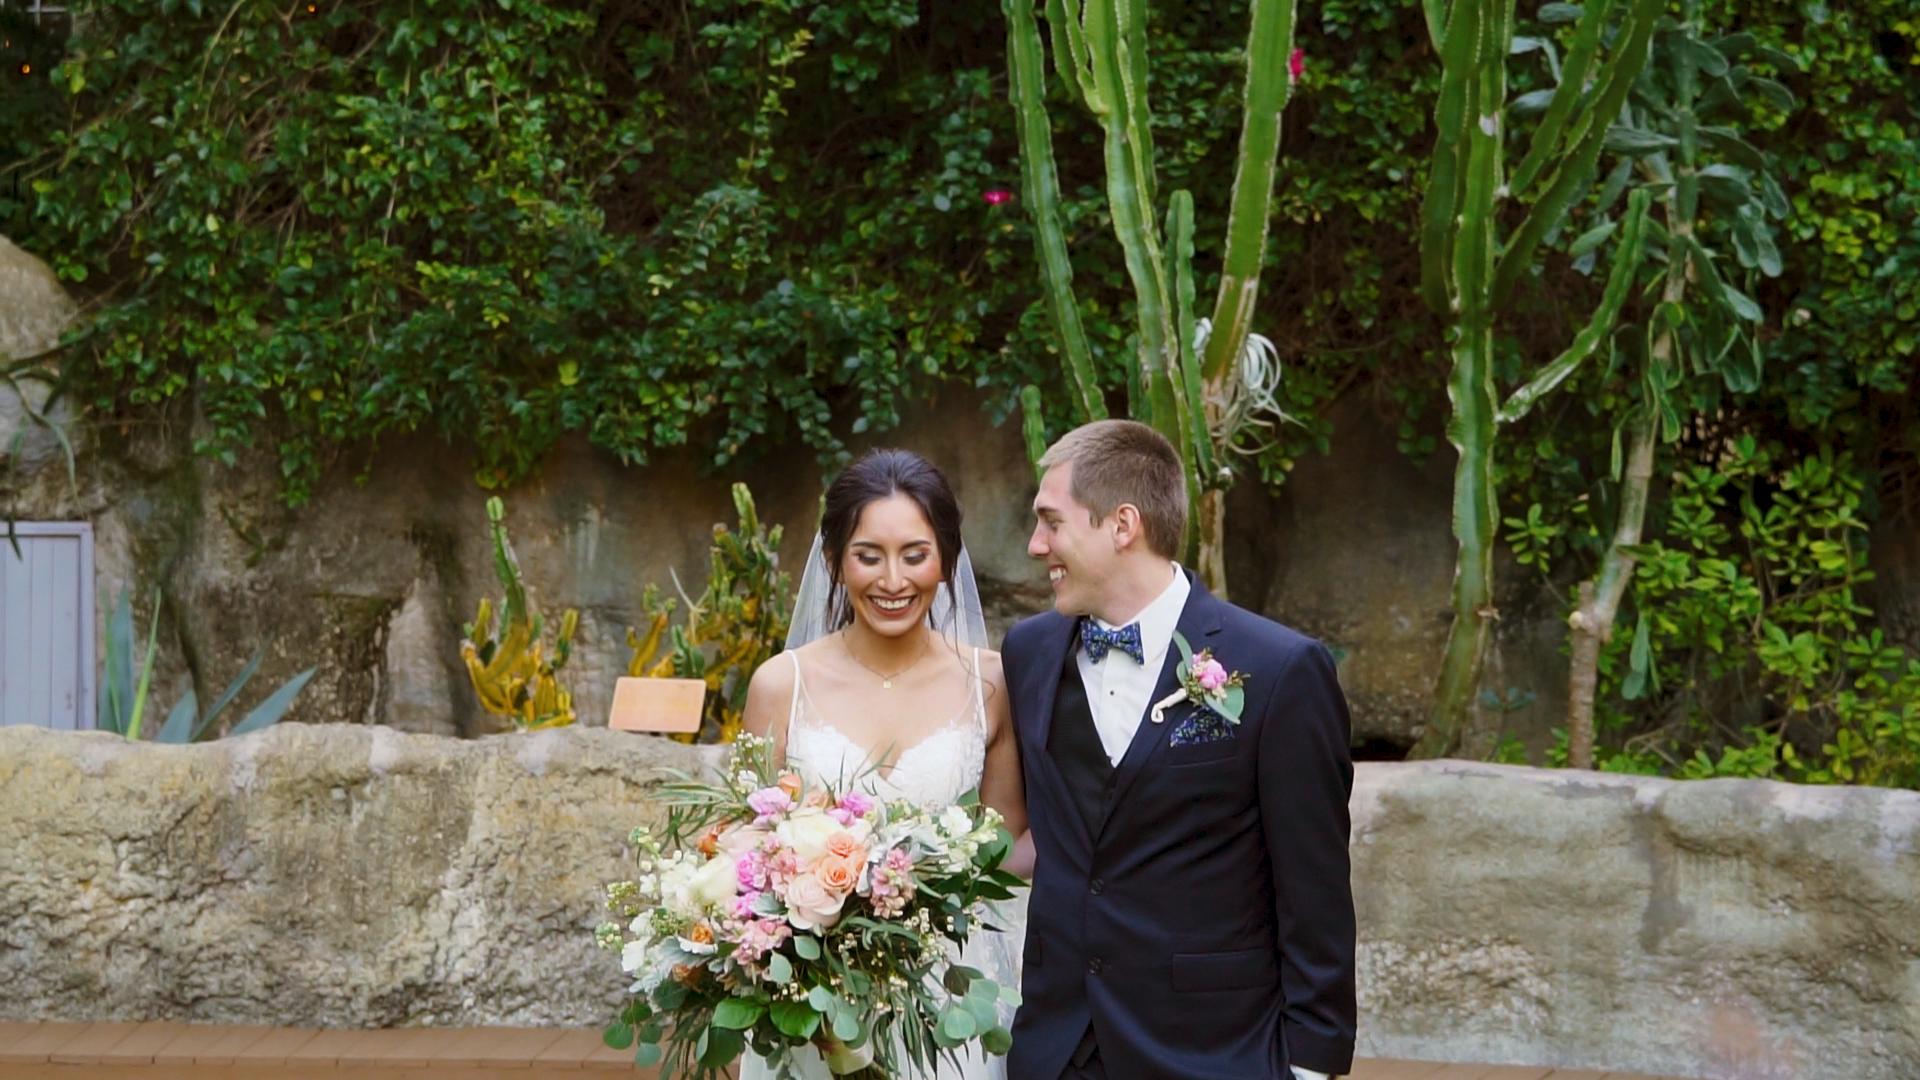 Tampa Wedding Photographer Tamp Wedding Videographer